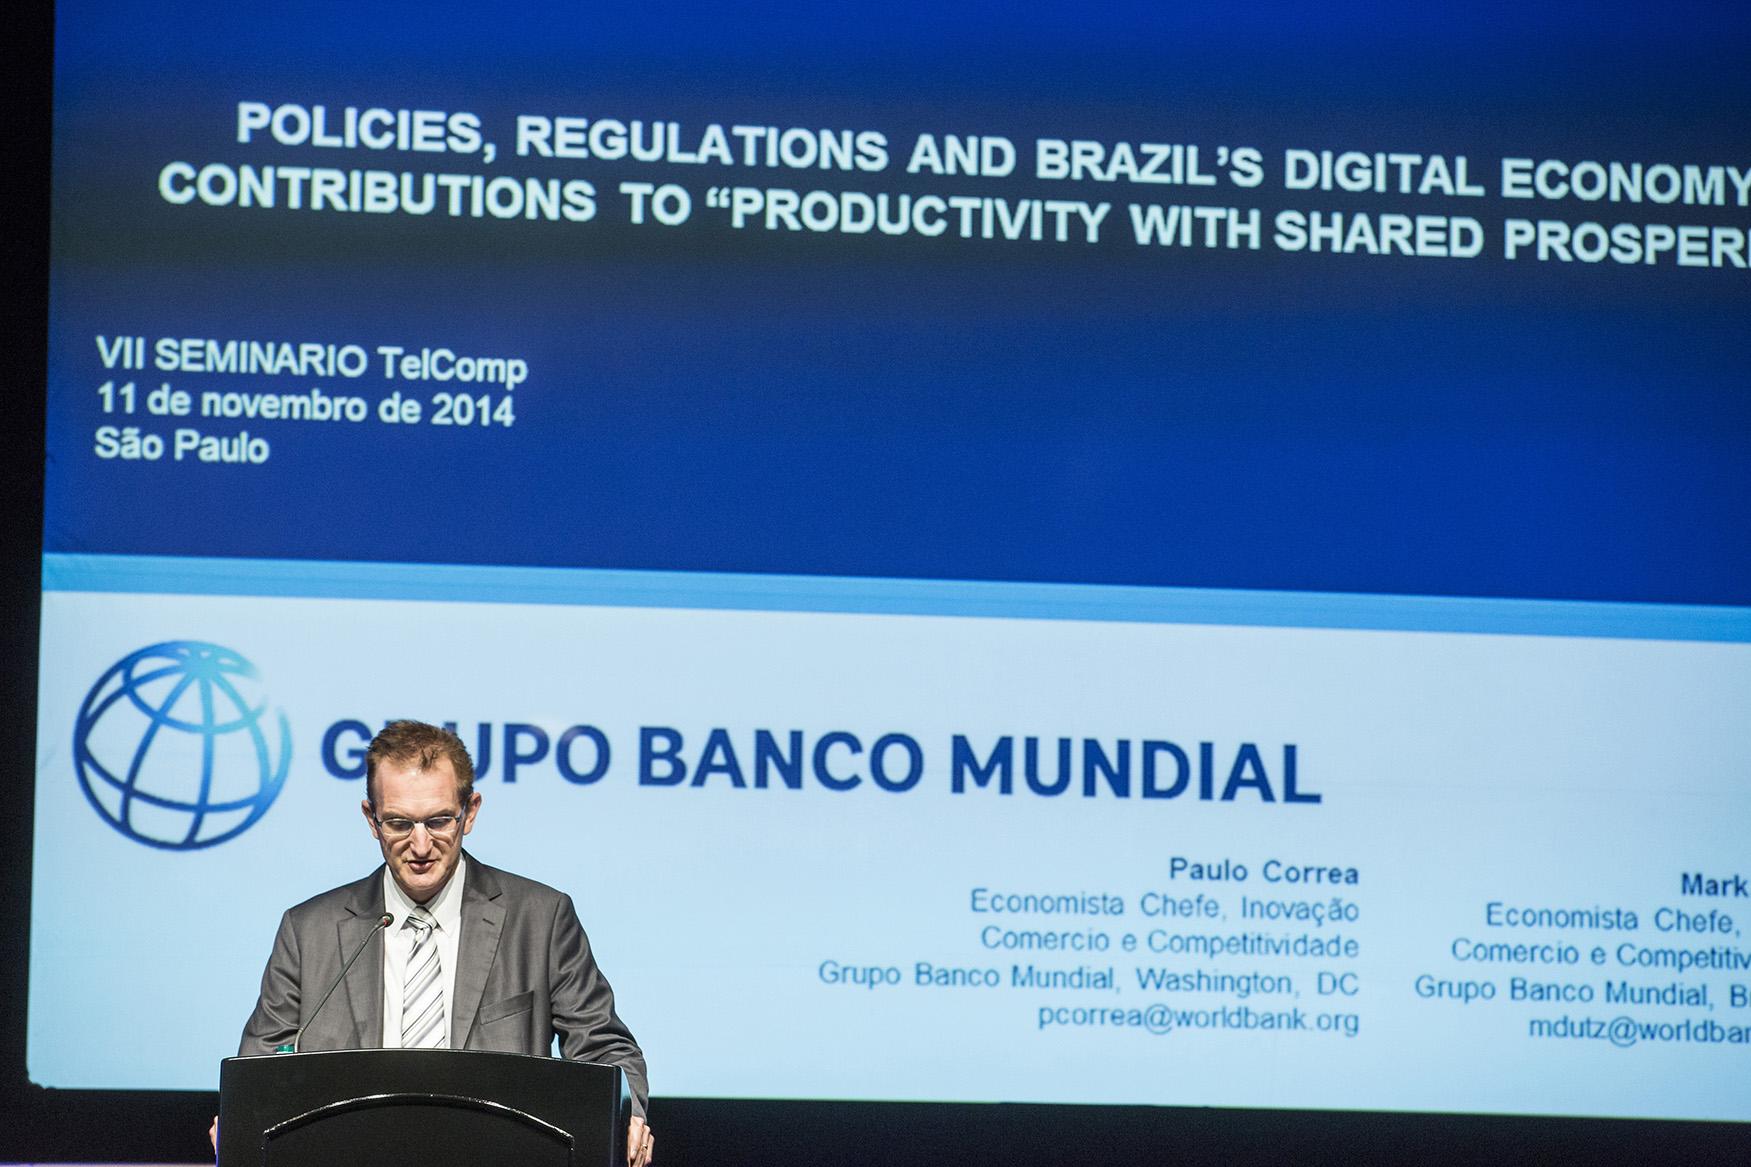 Dr. Mark Dutz economista principal Banco Mundial